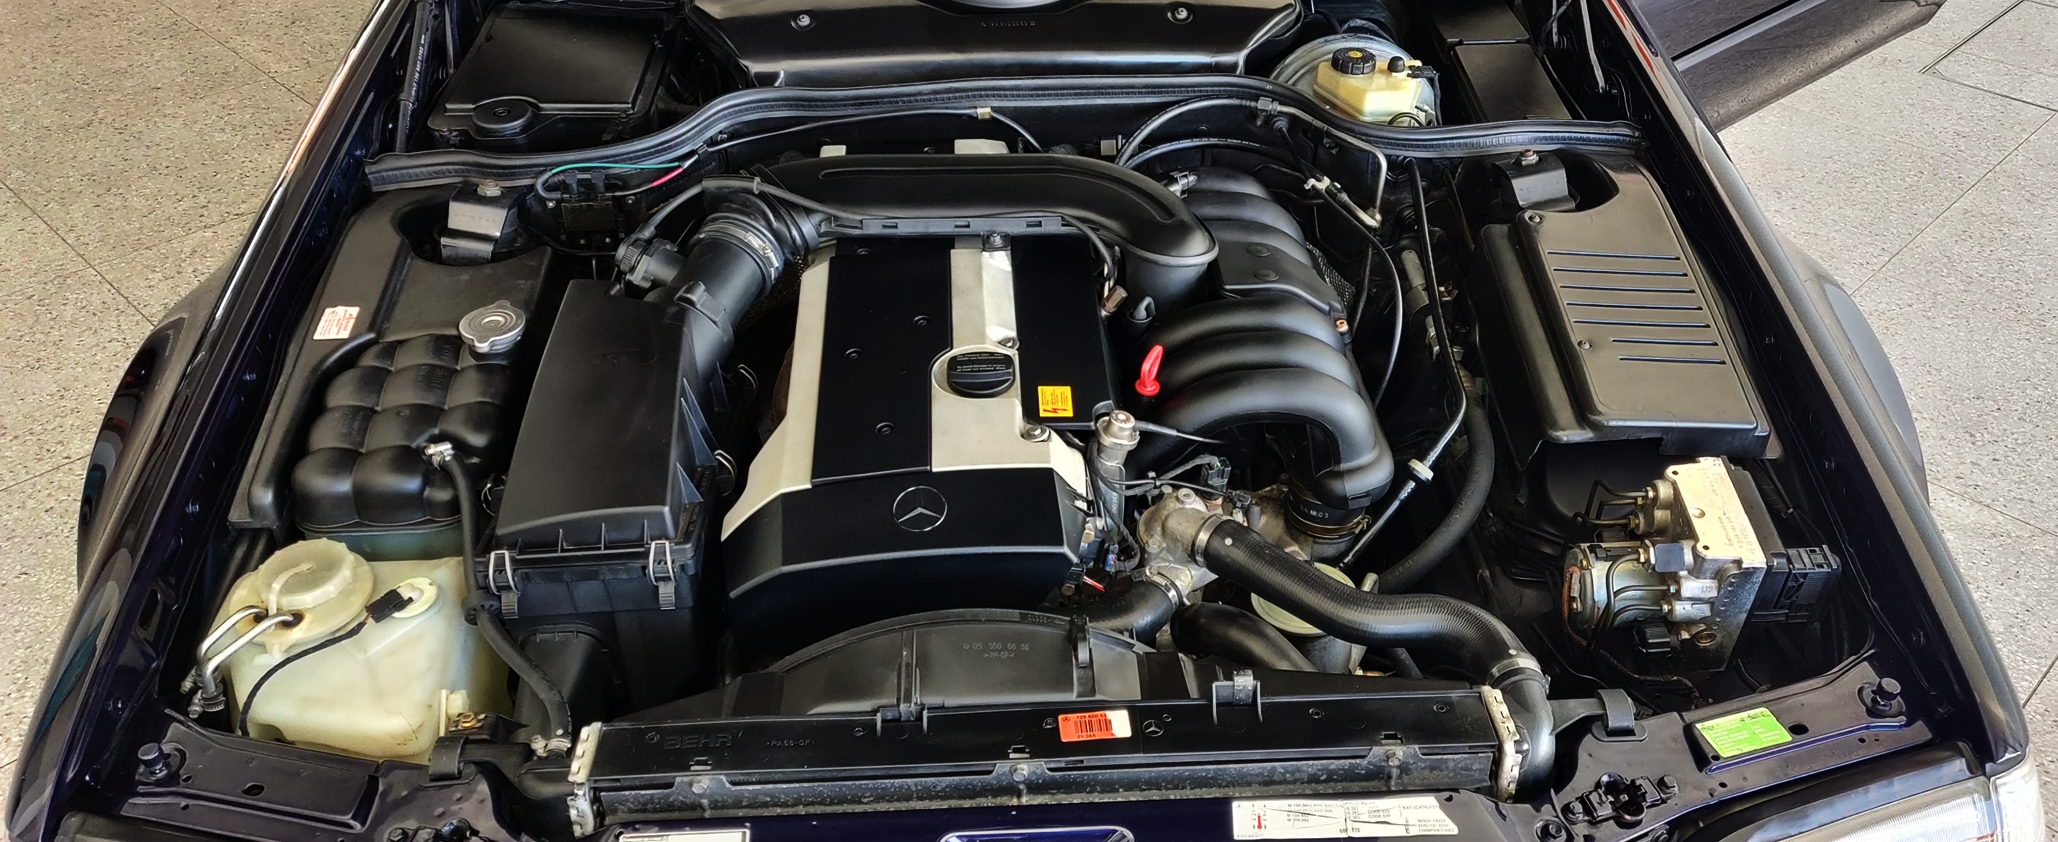 Mercedes-Benz SL 320  | Imagem 19